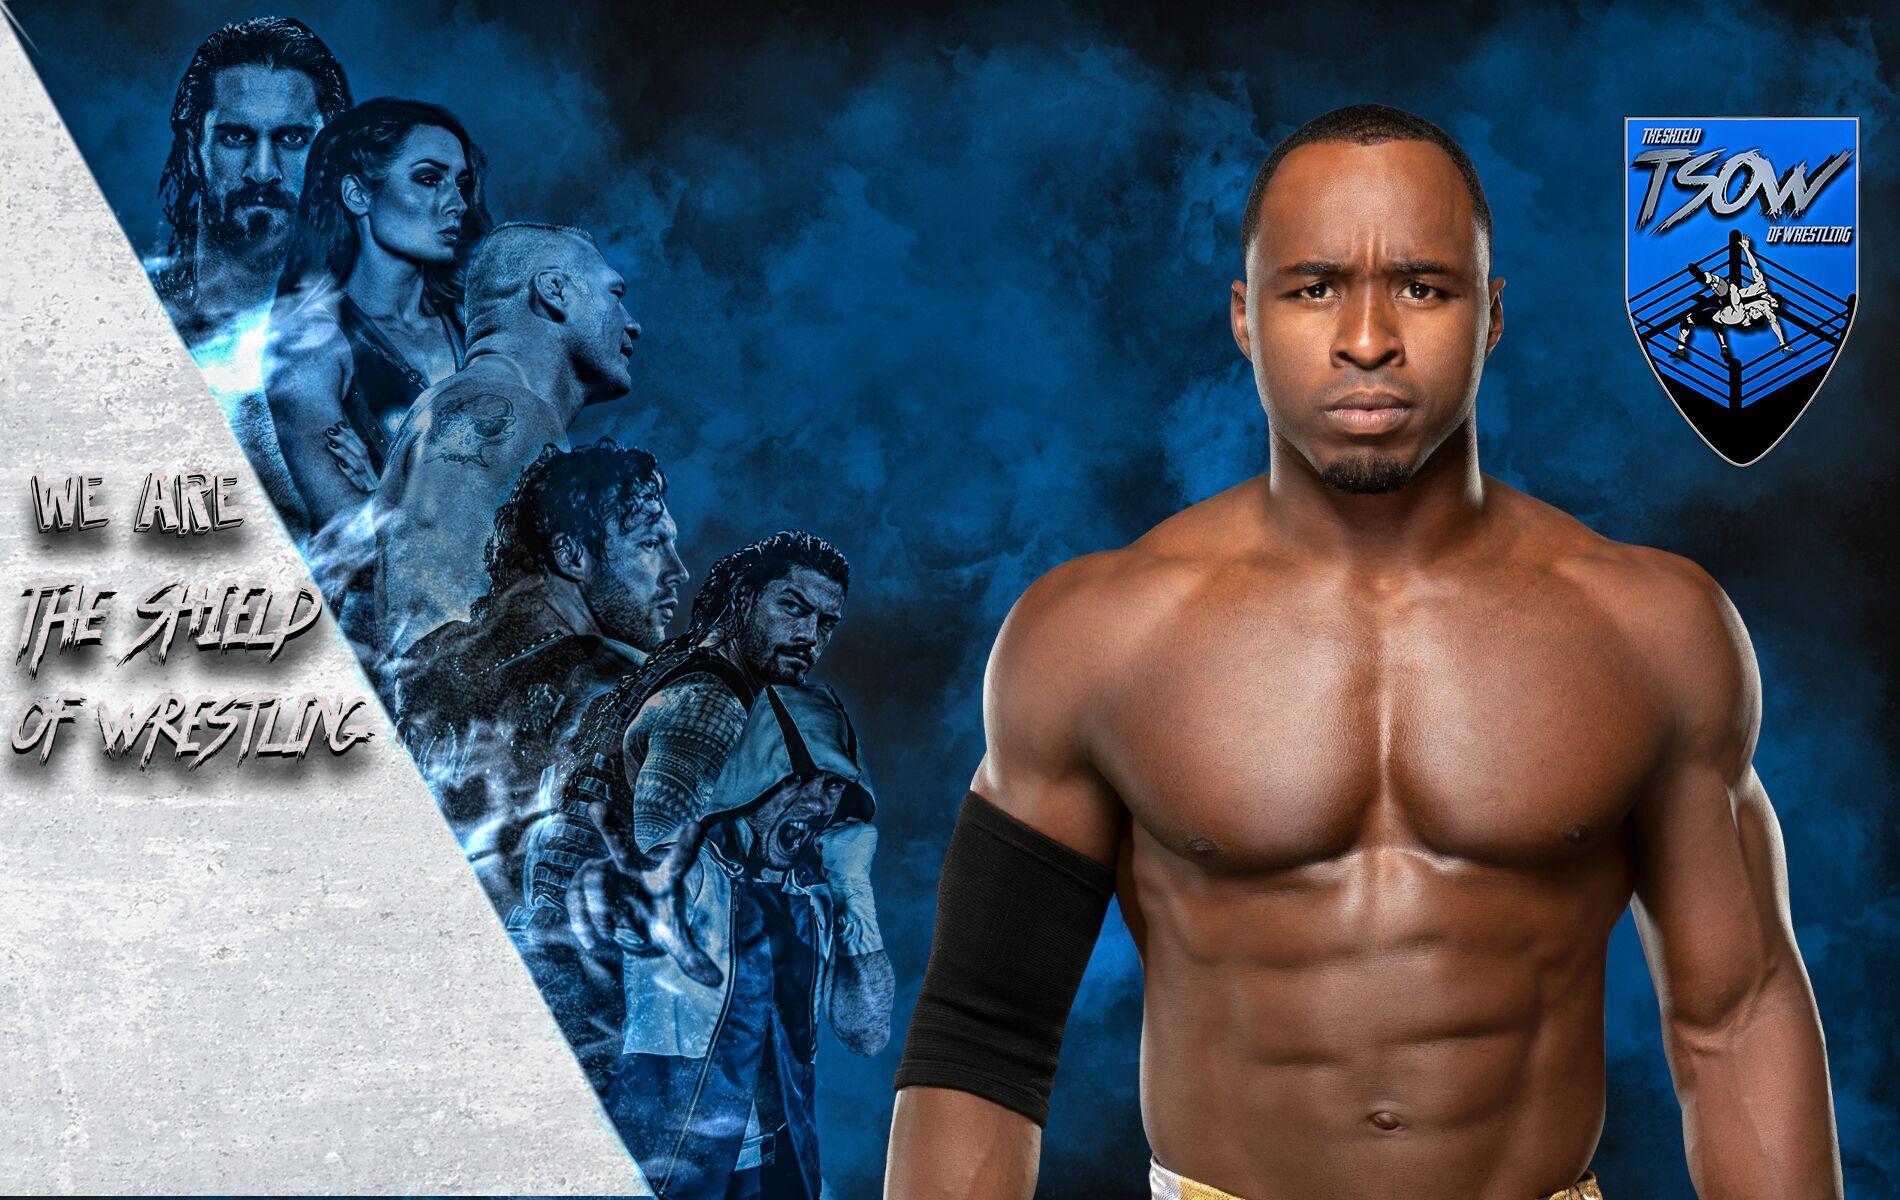 Jordan Myles contro la WWE